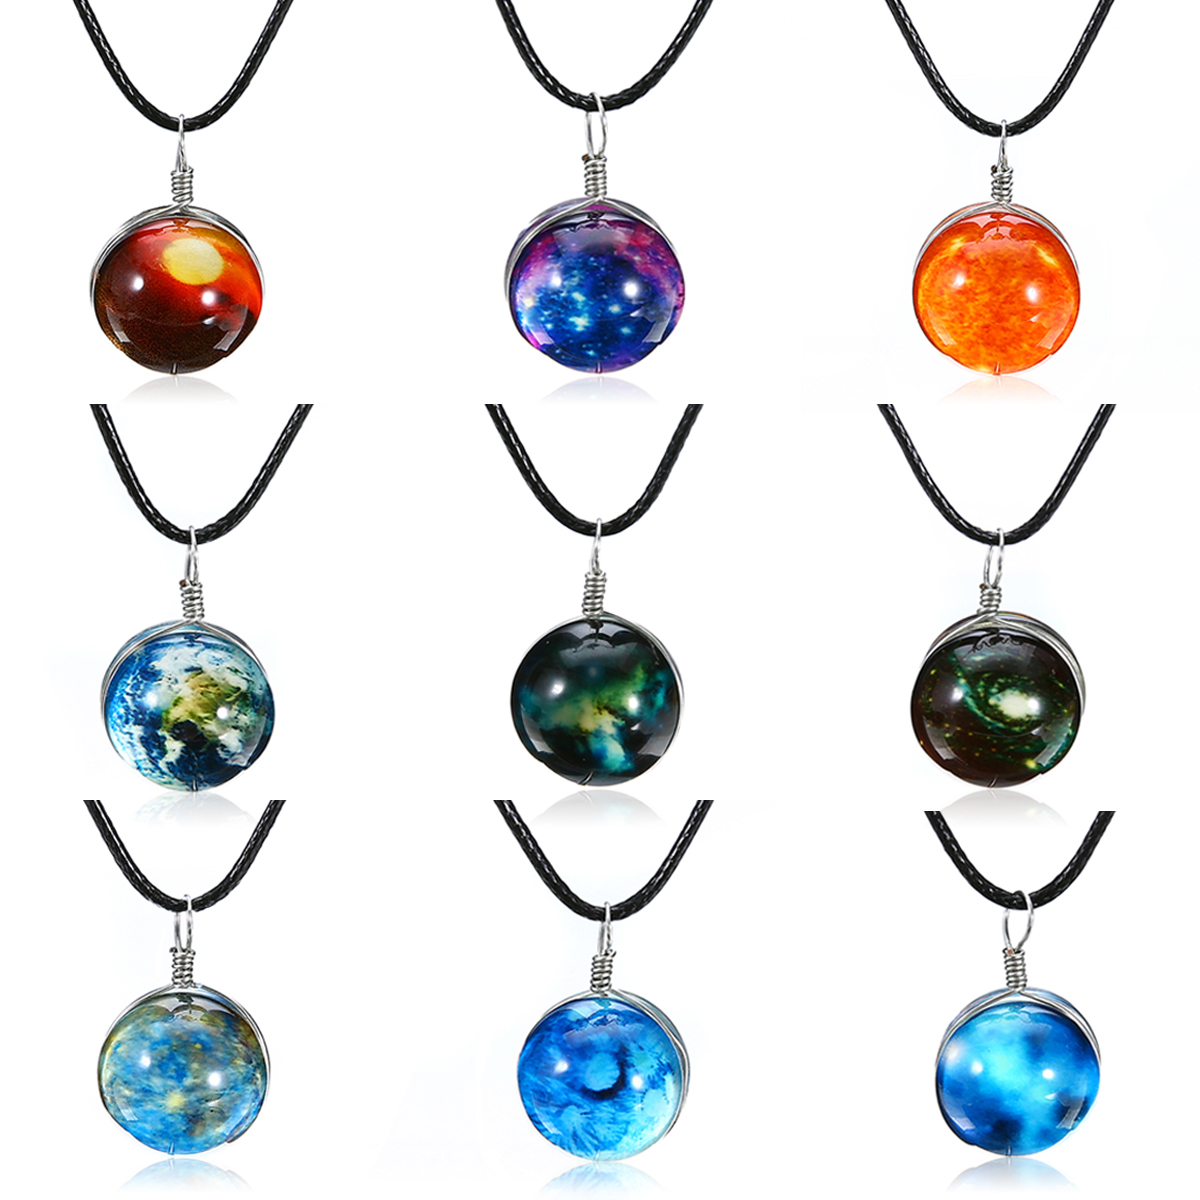 Shellhard Fashion Unisex Dreamy Glass Ball Star Universe Galaxy Pattern Pendant Necklace Colorful Charms Chain Luminous Jewelry